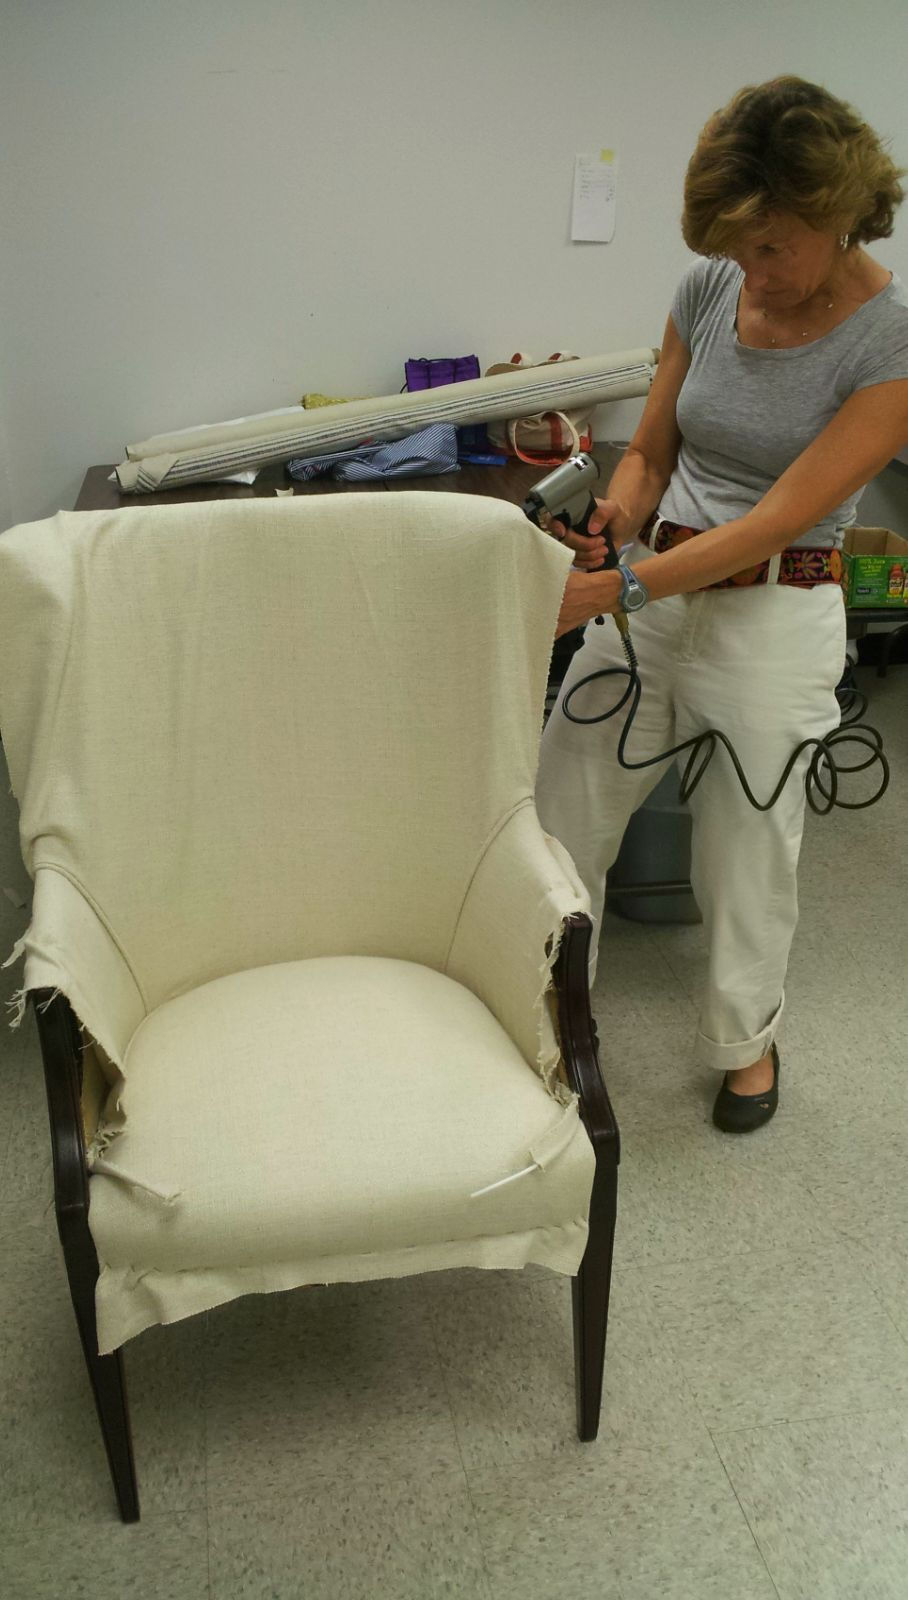 bf j 07 staple gun3 upholsteredchair chaise fauteuil. Black Bedroom Furniture Sets. Home Design Ideas